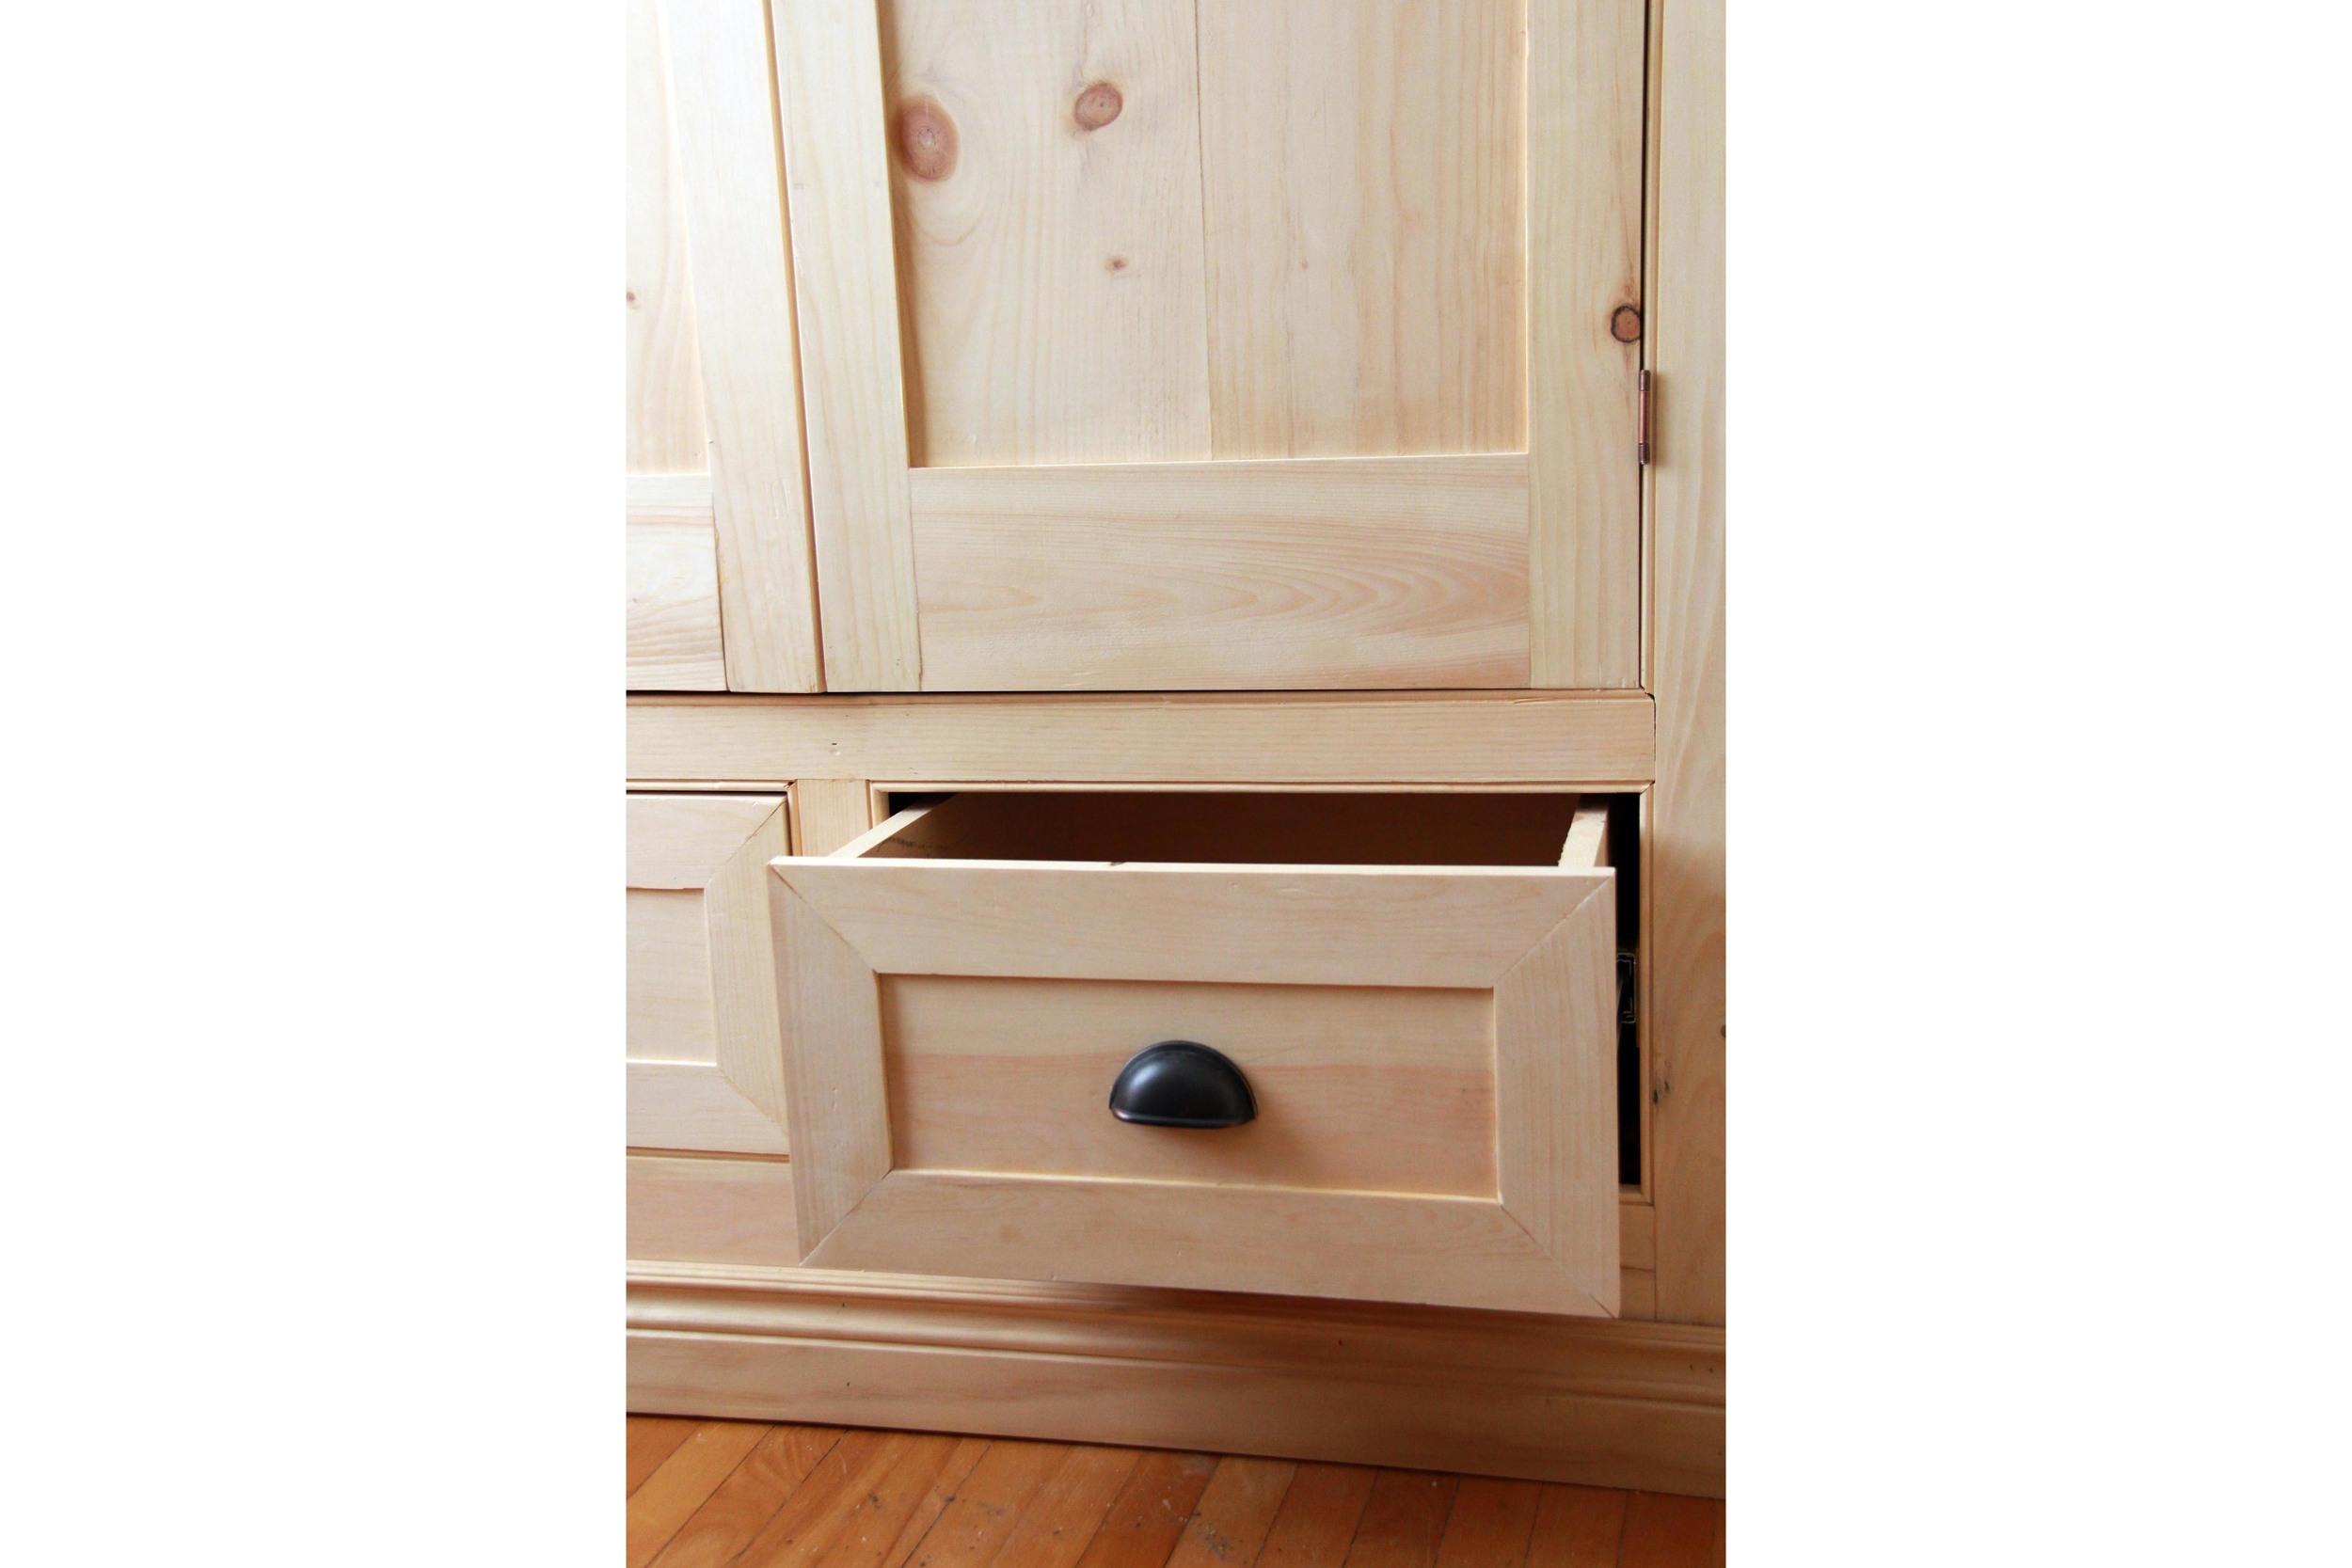 Riverview Design Solutions - Furniture Design - Armoire - Wardrobe - Prescott Ontario Tall.jpg